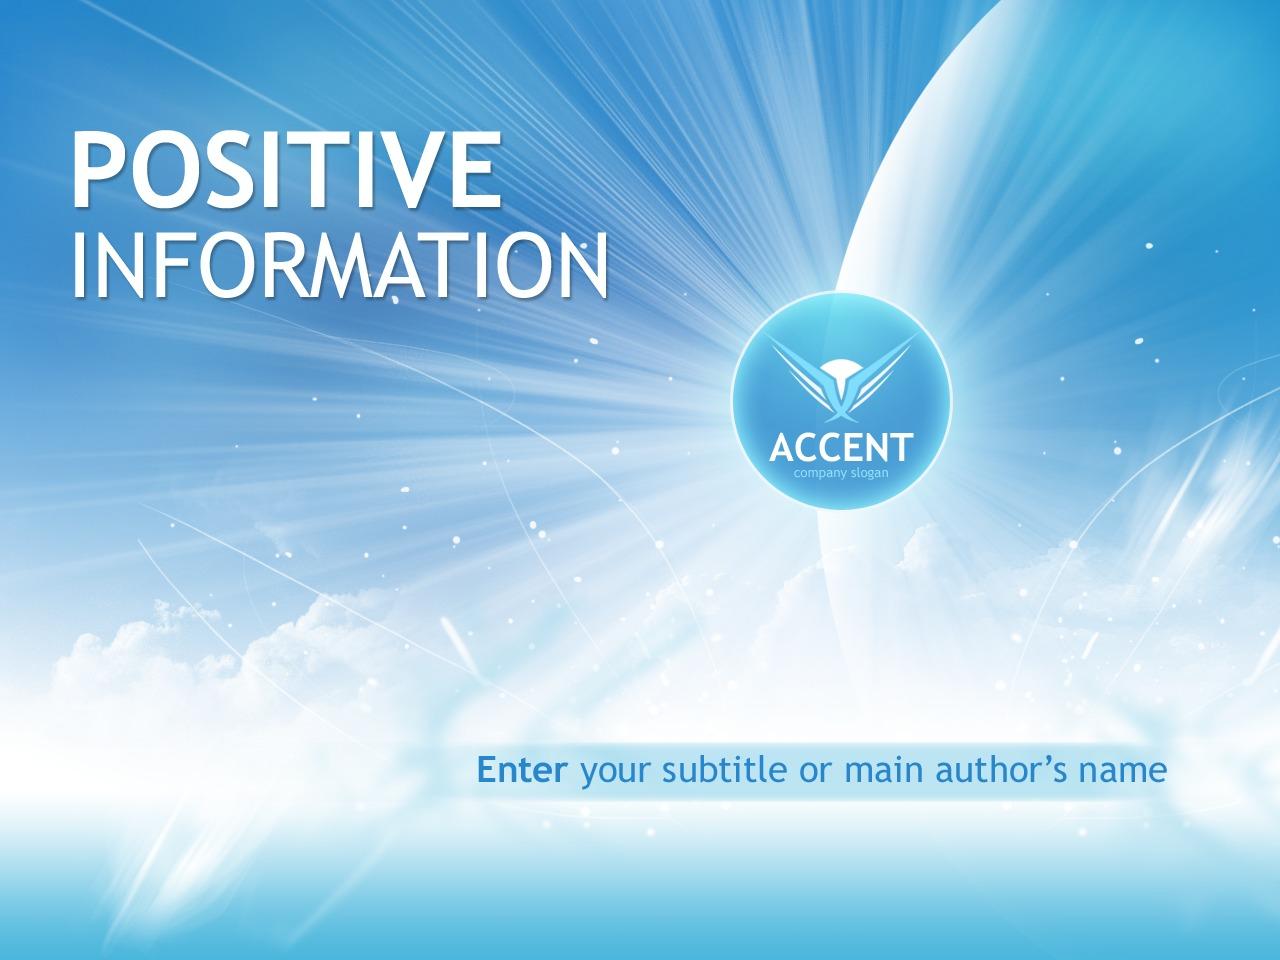 PowerPoint шаблон №35982 на тему бизнес и услуги - скриншот